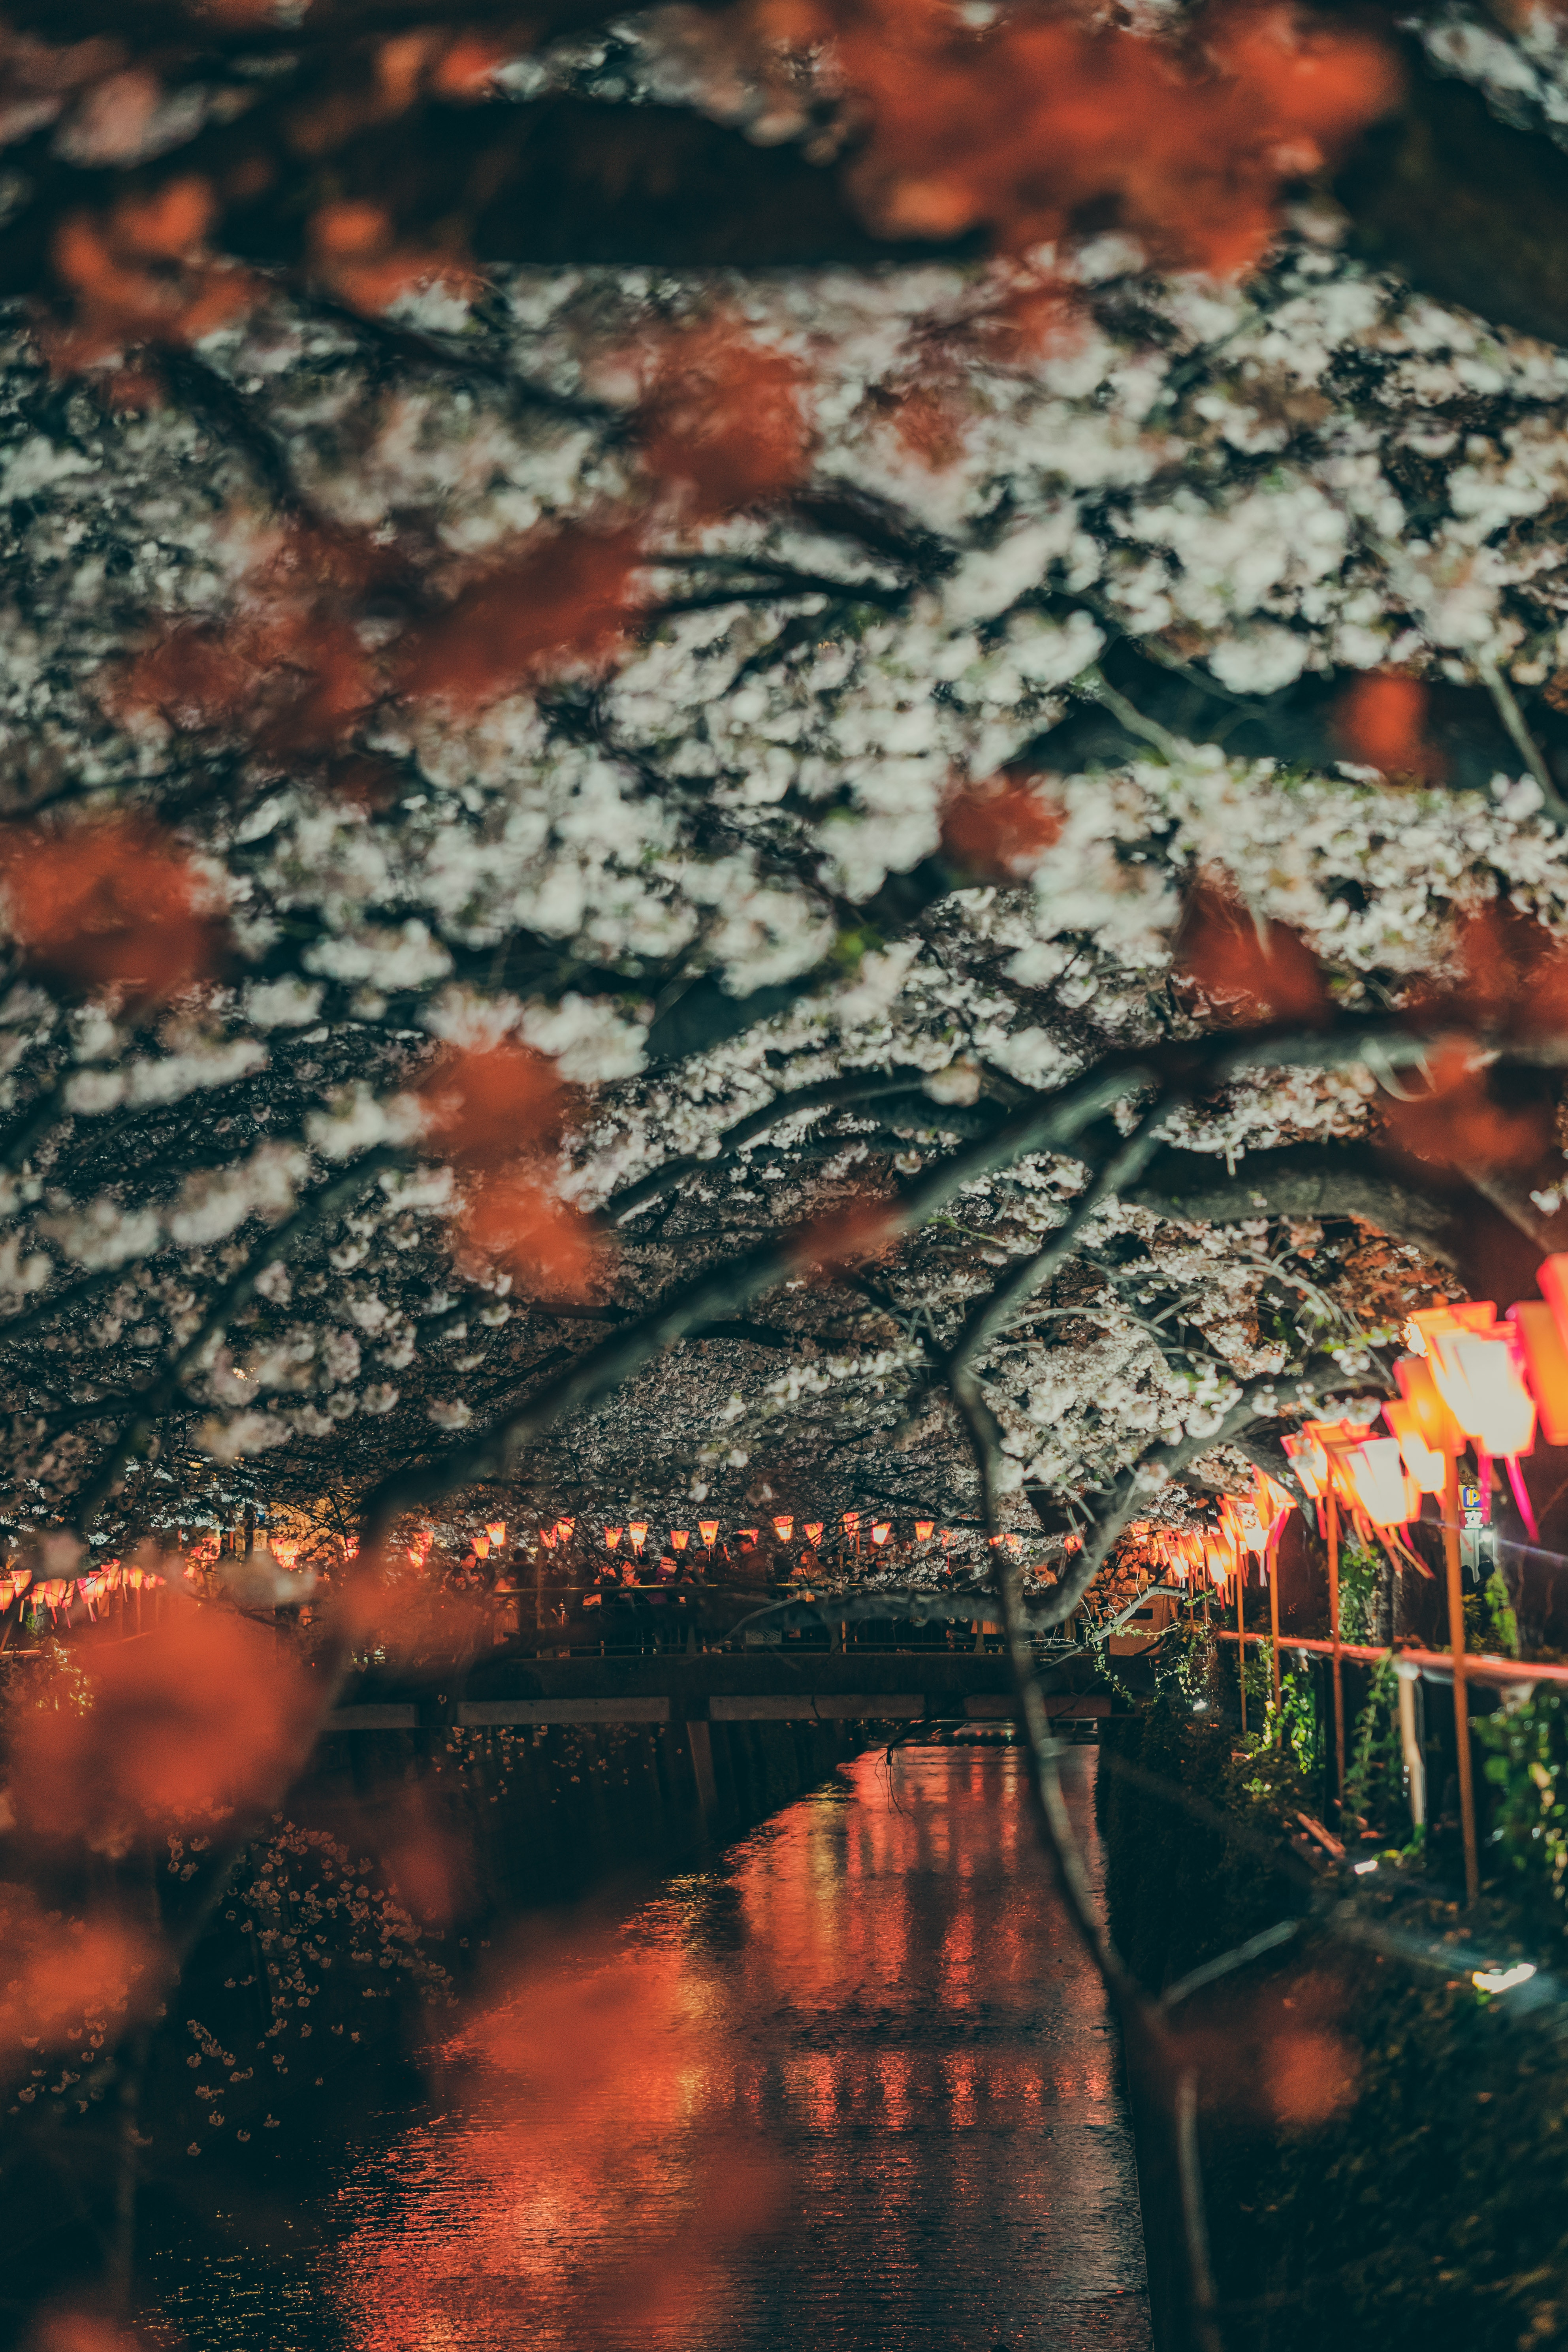 140015 Screensavers and Wallpapers Sakura for phone. Download Cities, Rivers, Sakura, Lights, Park, Lanterns, Bridge, Embankment, Quay pictures for free